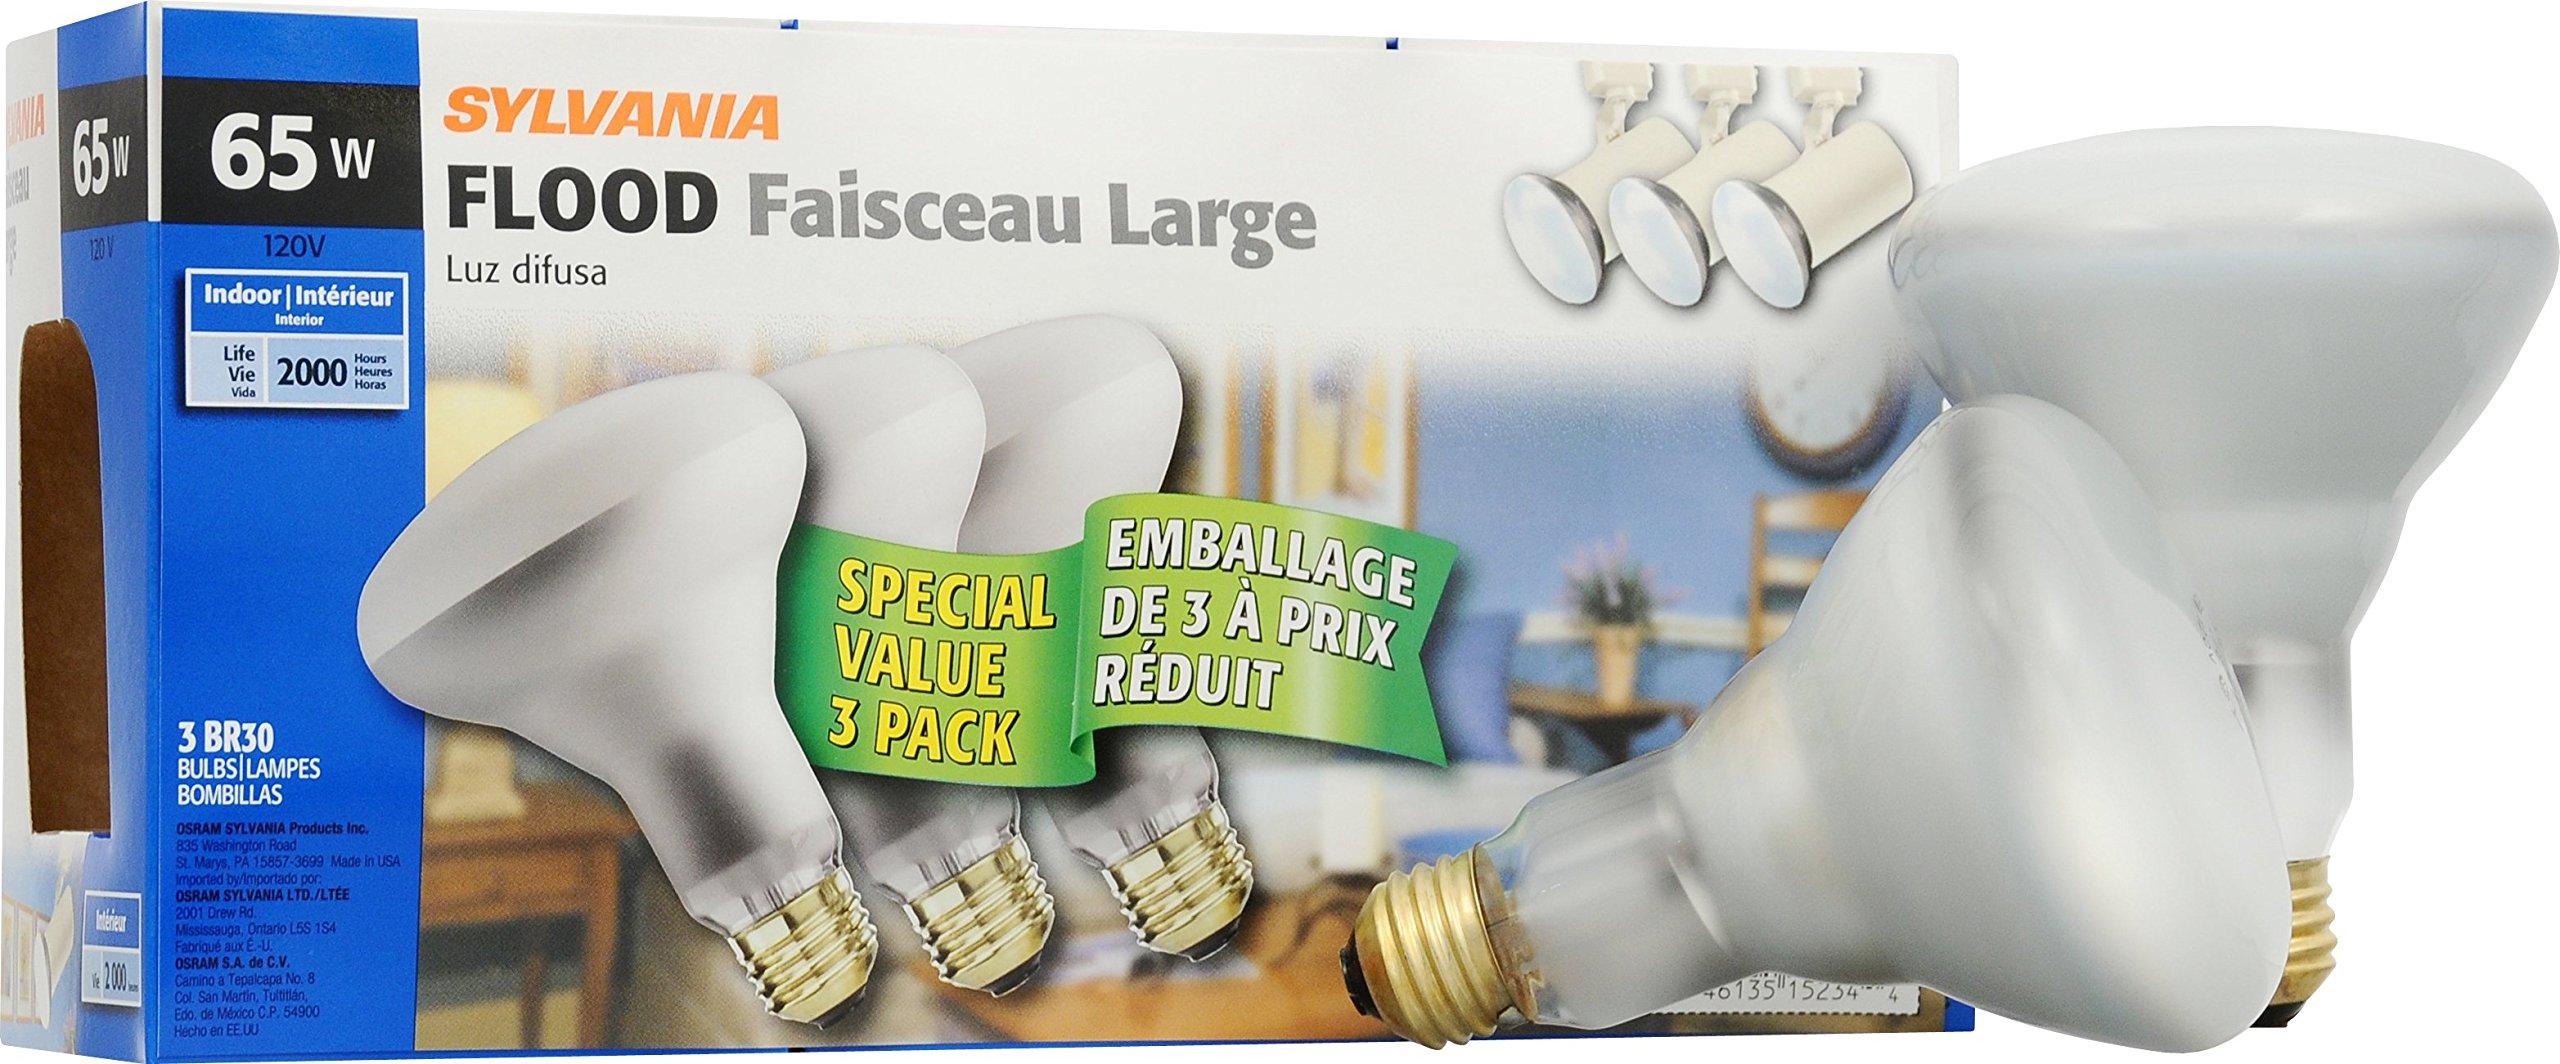 Sylvania 65 Watt BR30 Incandescent Reflector Floodlight Bulb, 2850K Soft White, E26 Medium Base, 12 Pack